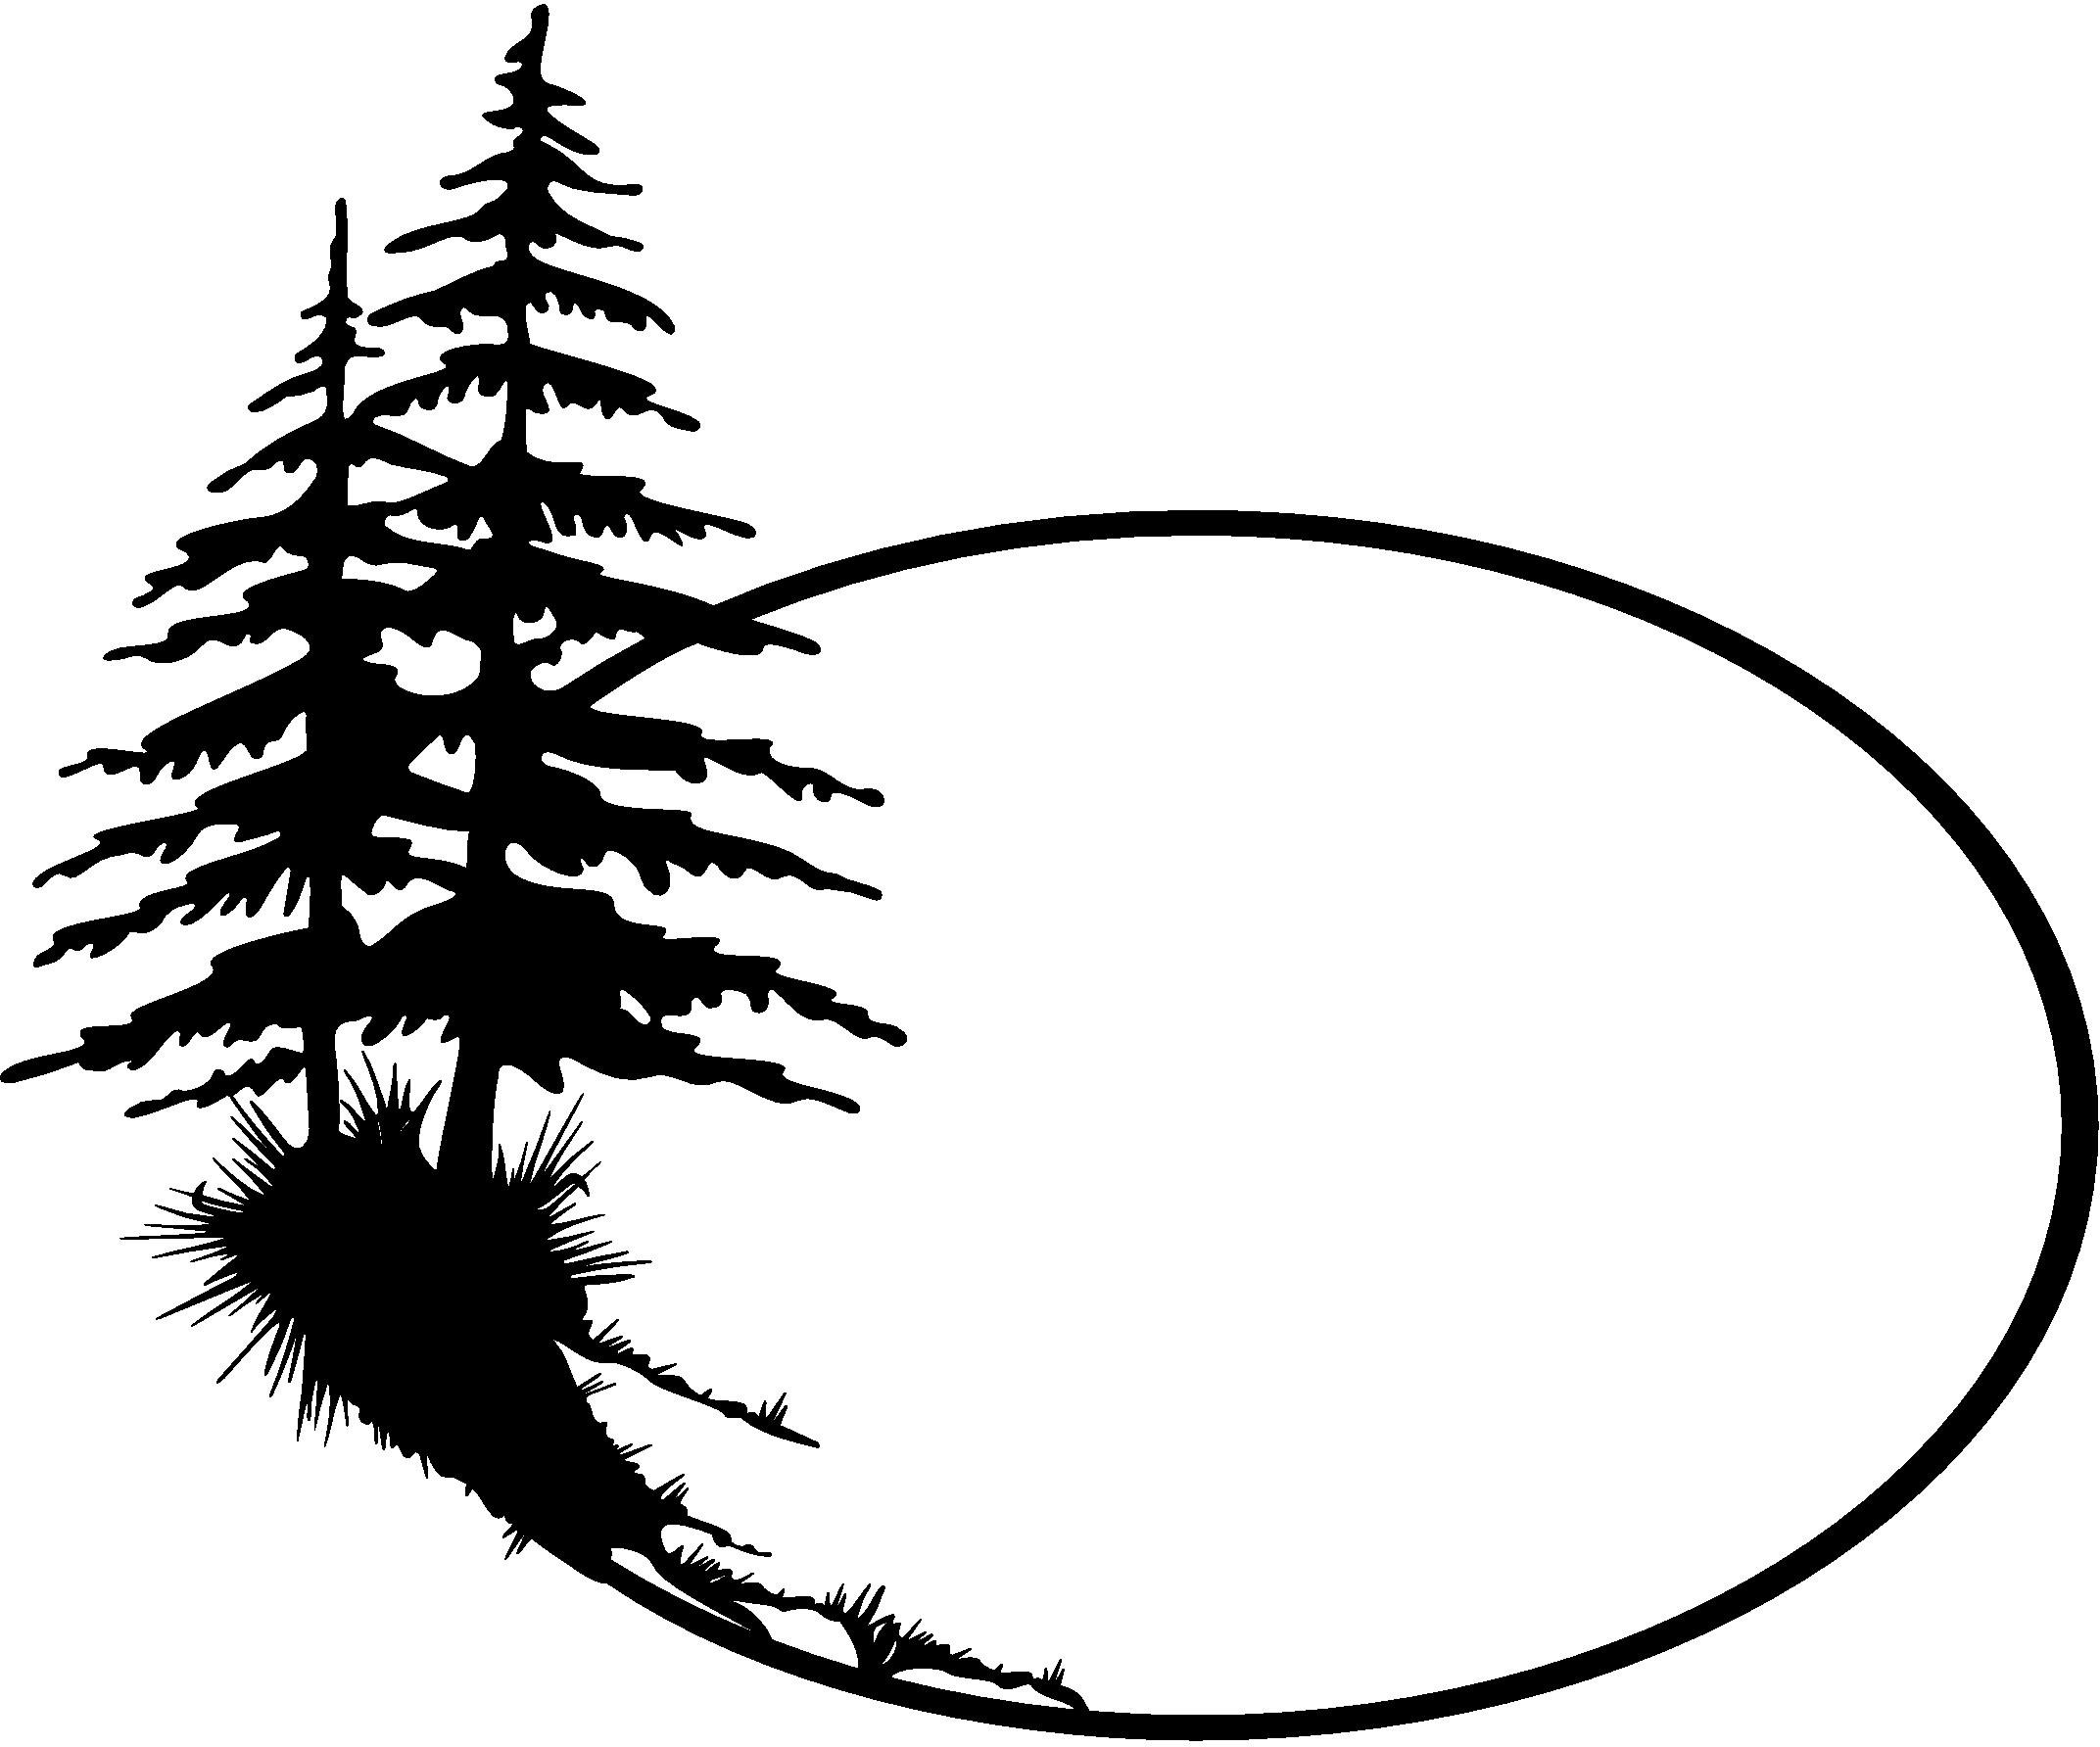 2144x1784 Pine Tree Silhouette Drawing